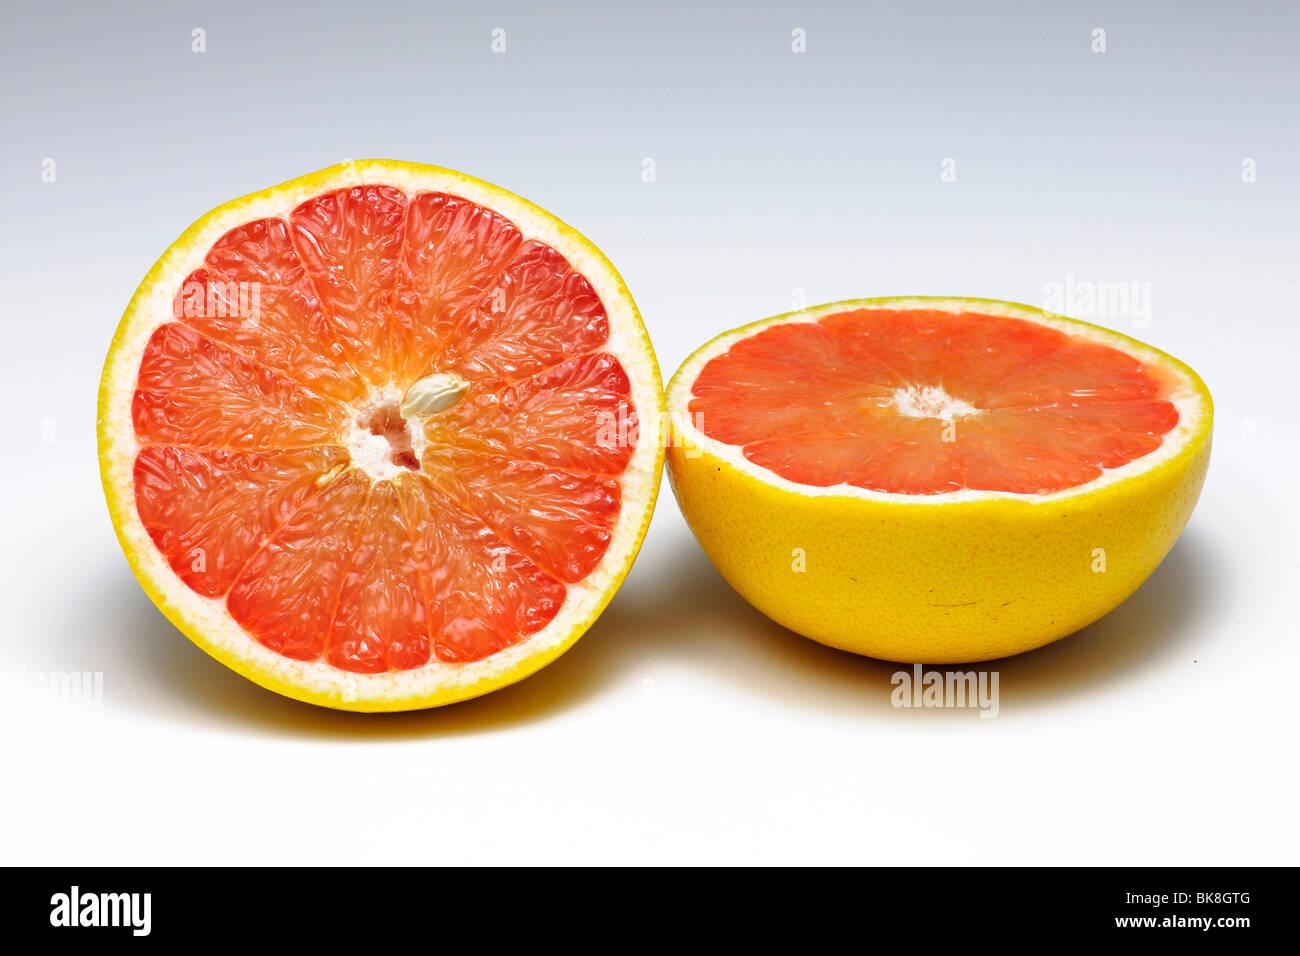 Red grapefruit (Citrus paradisi) cut into halves - Stock Image